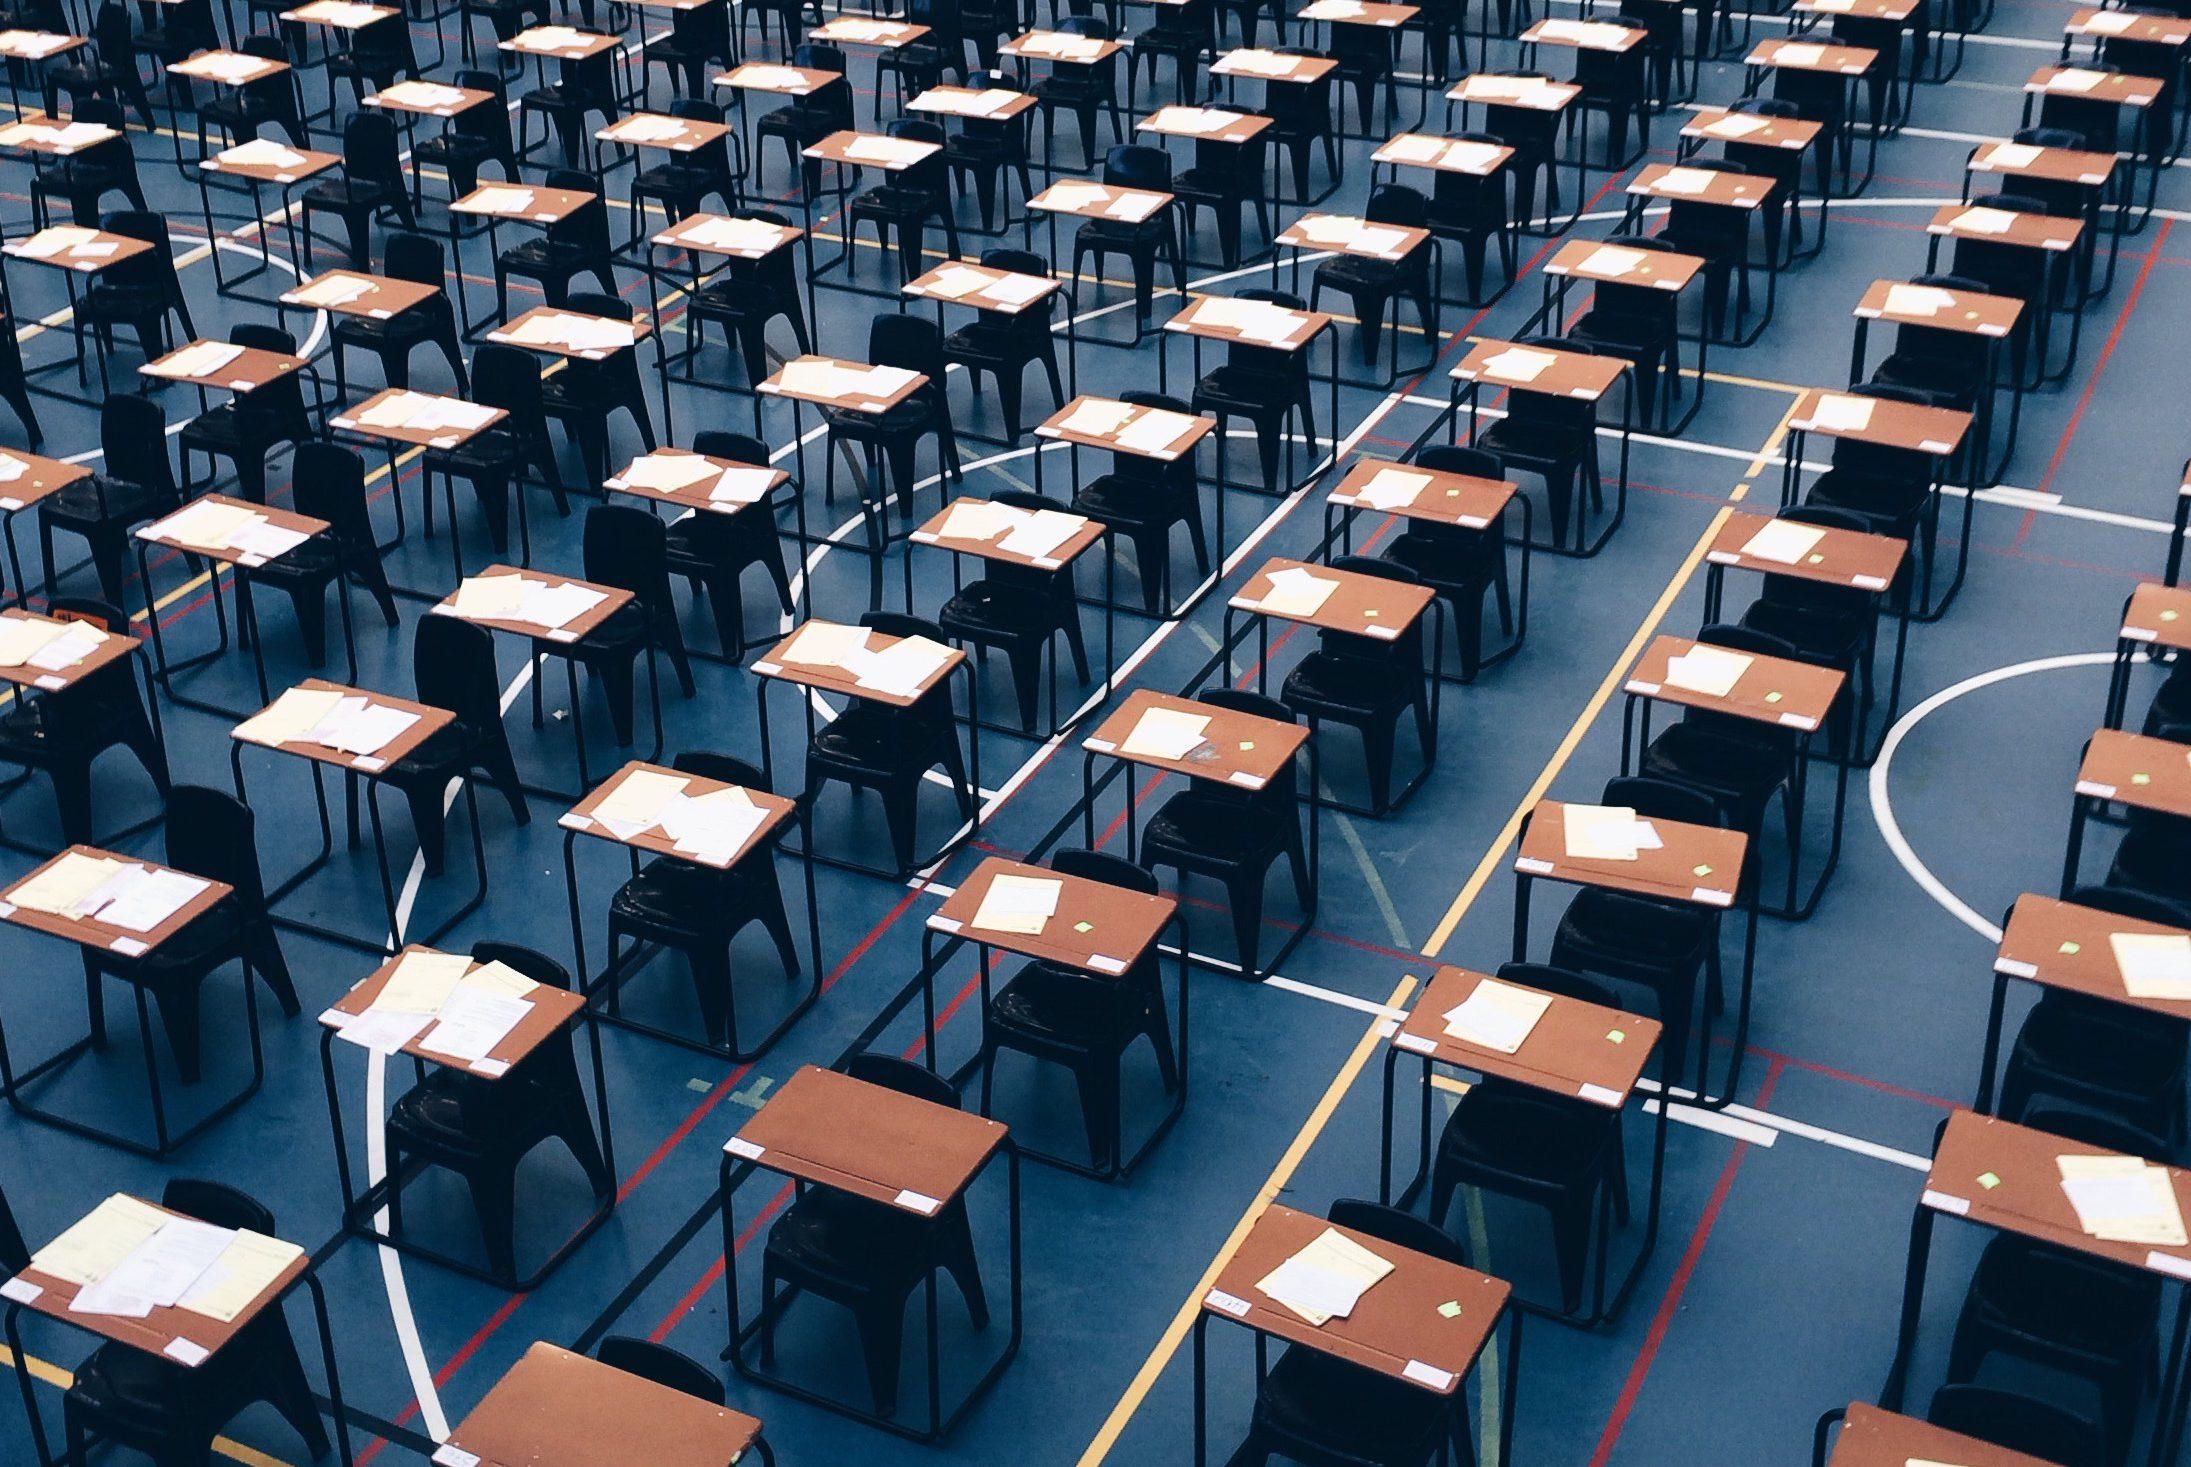 """Personalised"" or standardized testing?"